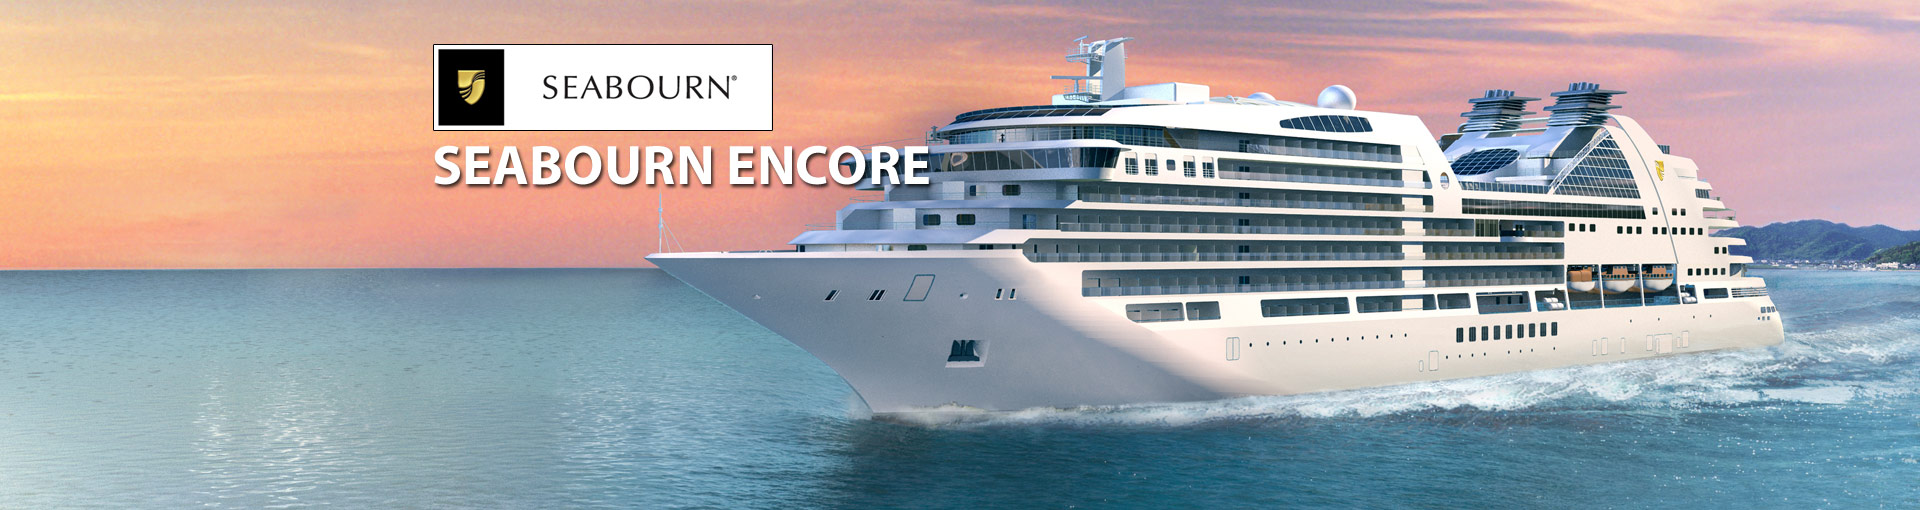 Seabourn Encore Cruise Ship, 2017 Seabourn Encore destinations, deals ...